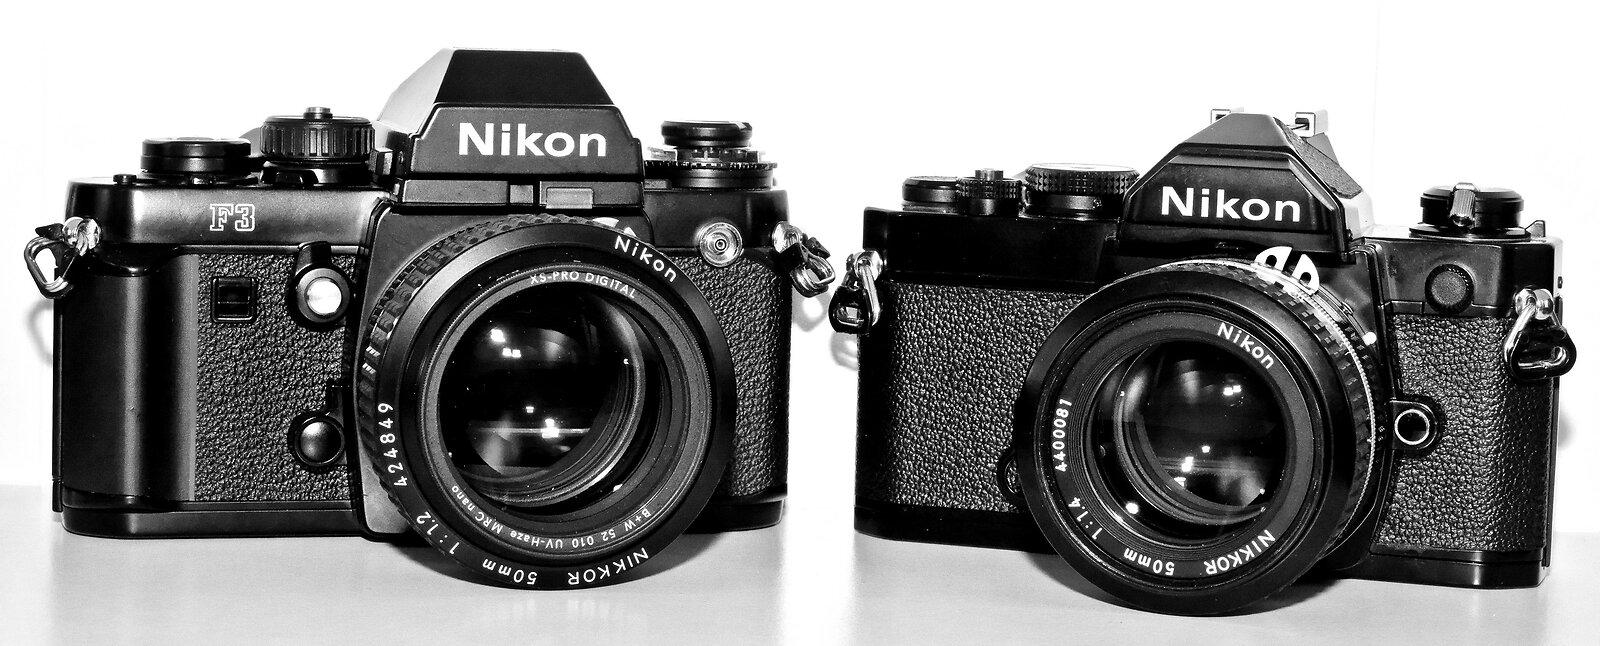 s_Nikon F3 and FM bw_s.jpg